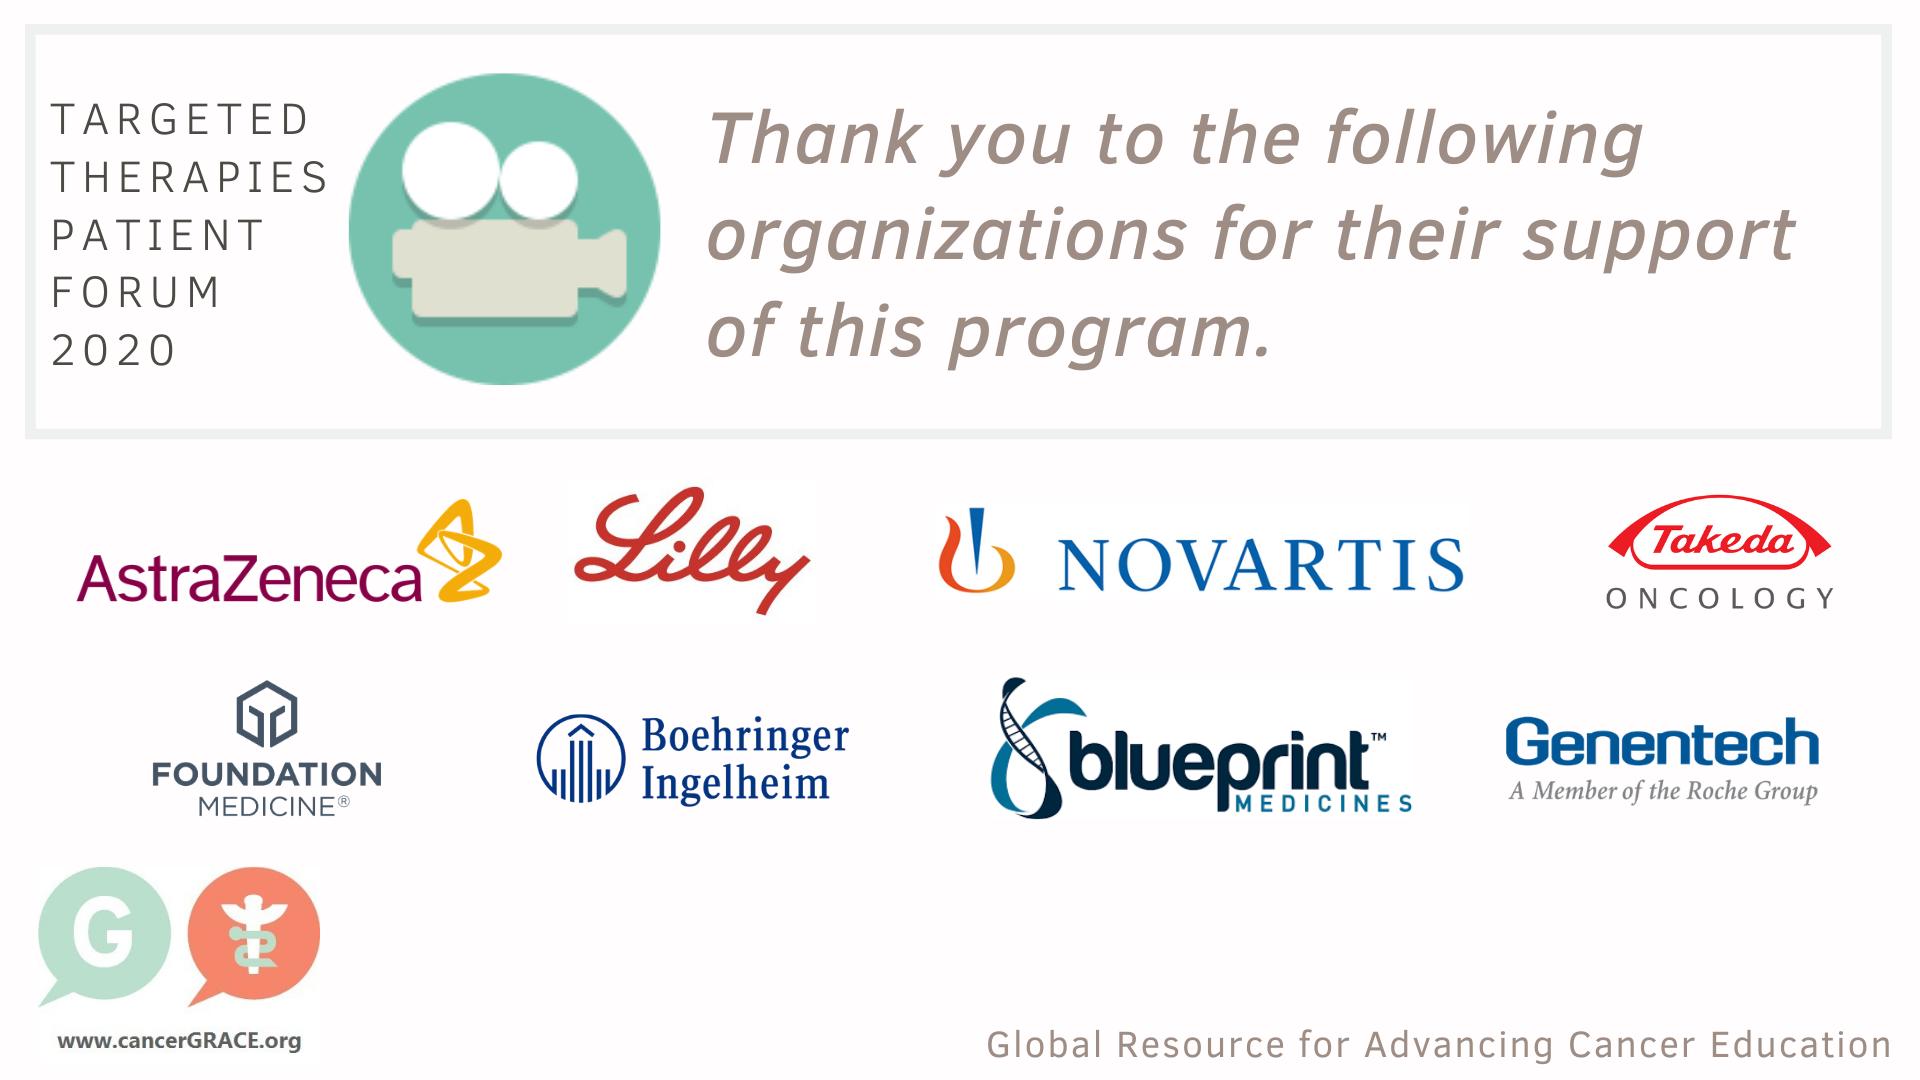 We thank our sponsors for their support of this event! AstraZeneca, Lilly, Novartis, Takeda, Foundation Medicine, Boehringer Ingelheim, Blueprint Medicines and Genentech